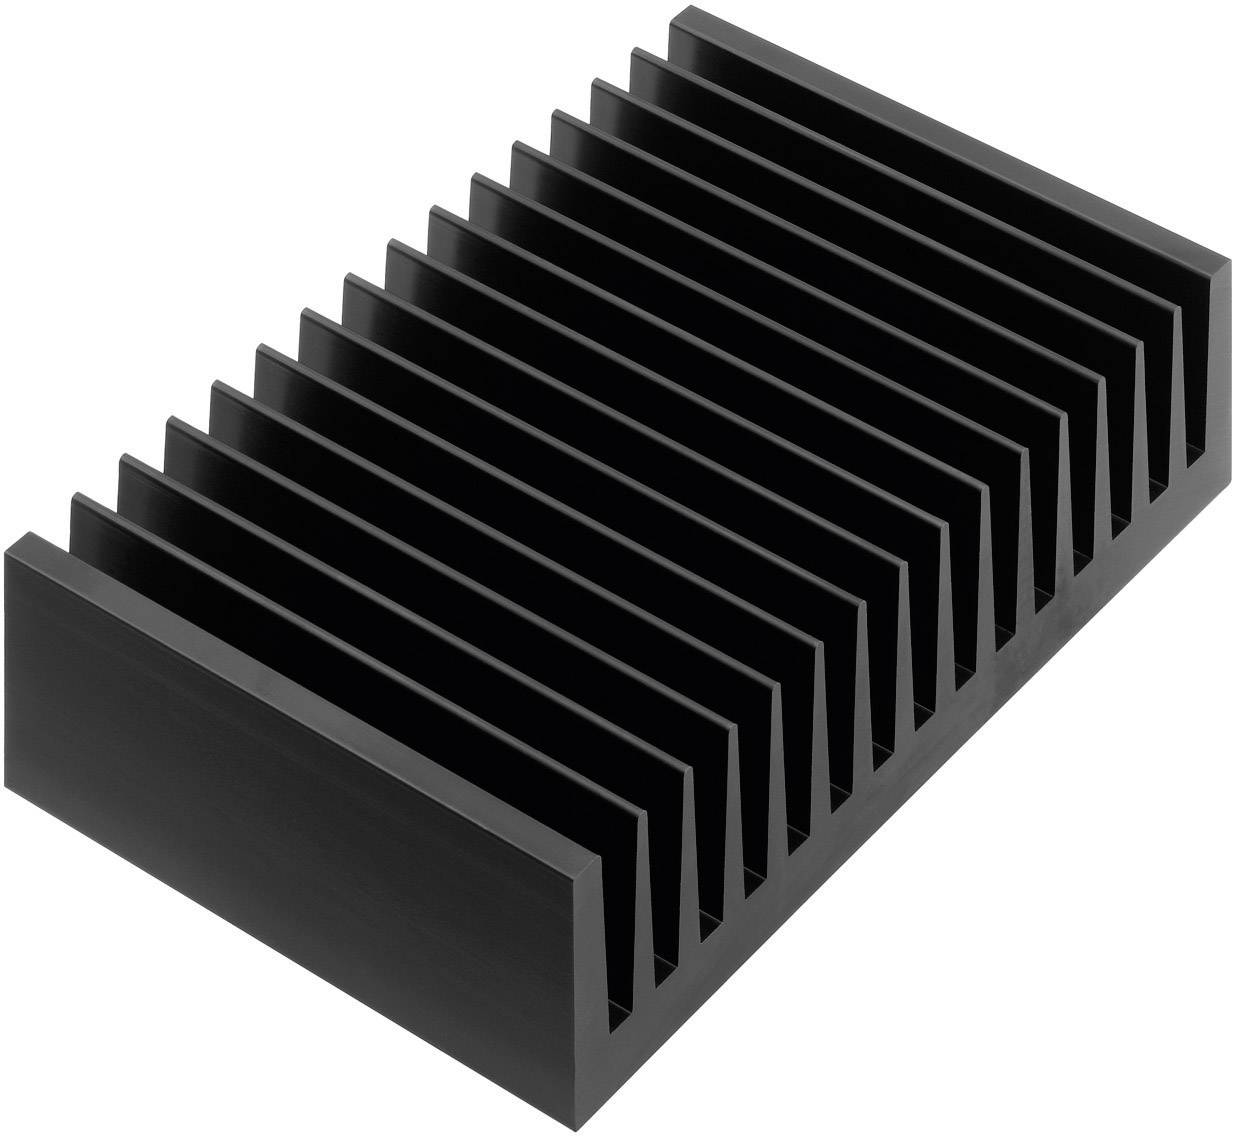 Profilový chladič Pada Engineering 8214/100/N, 1.18 K/W, (d x š x v) 100 x 160 x 40 mm